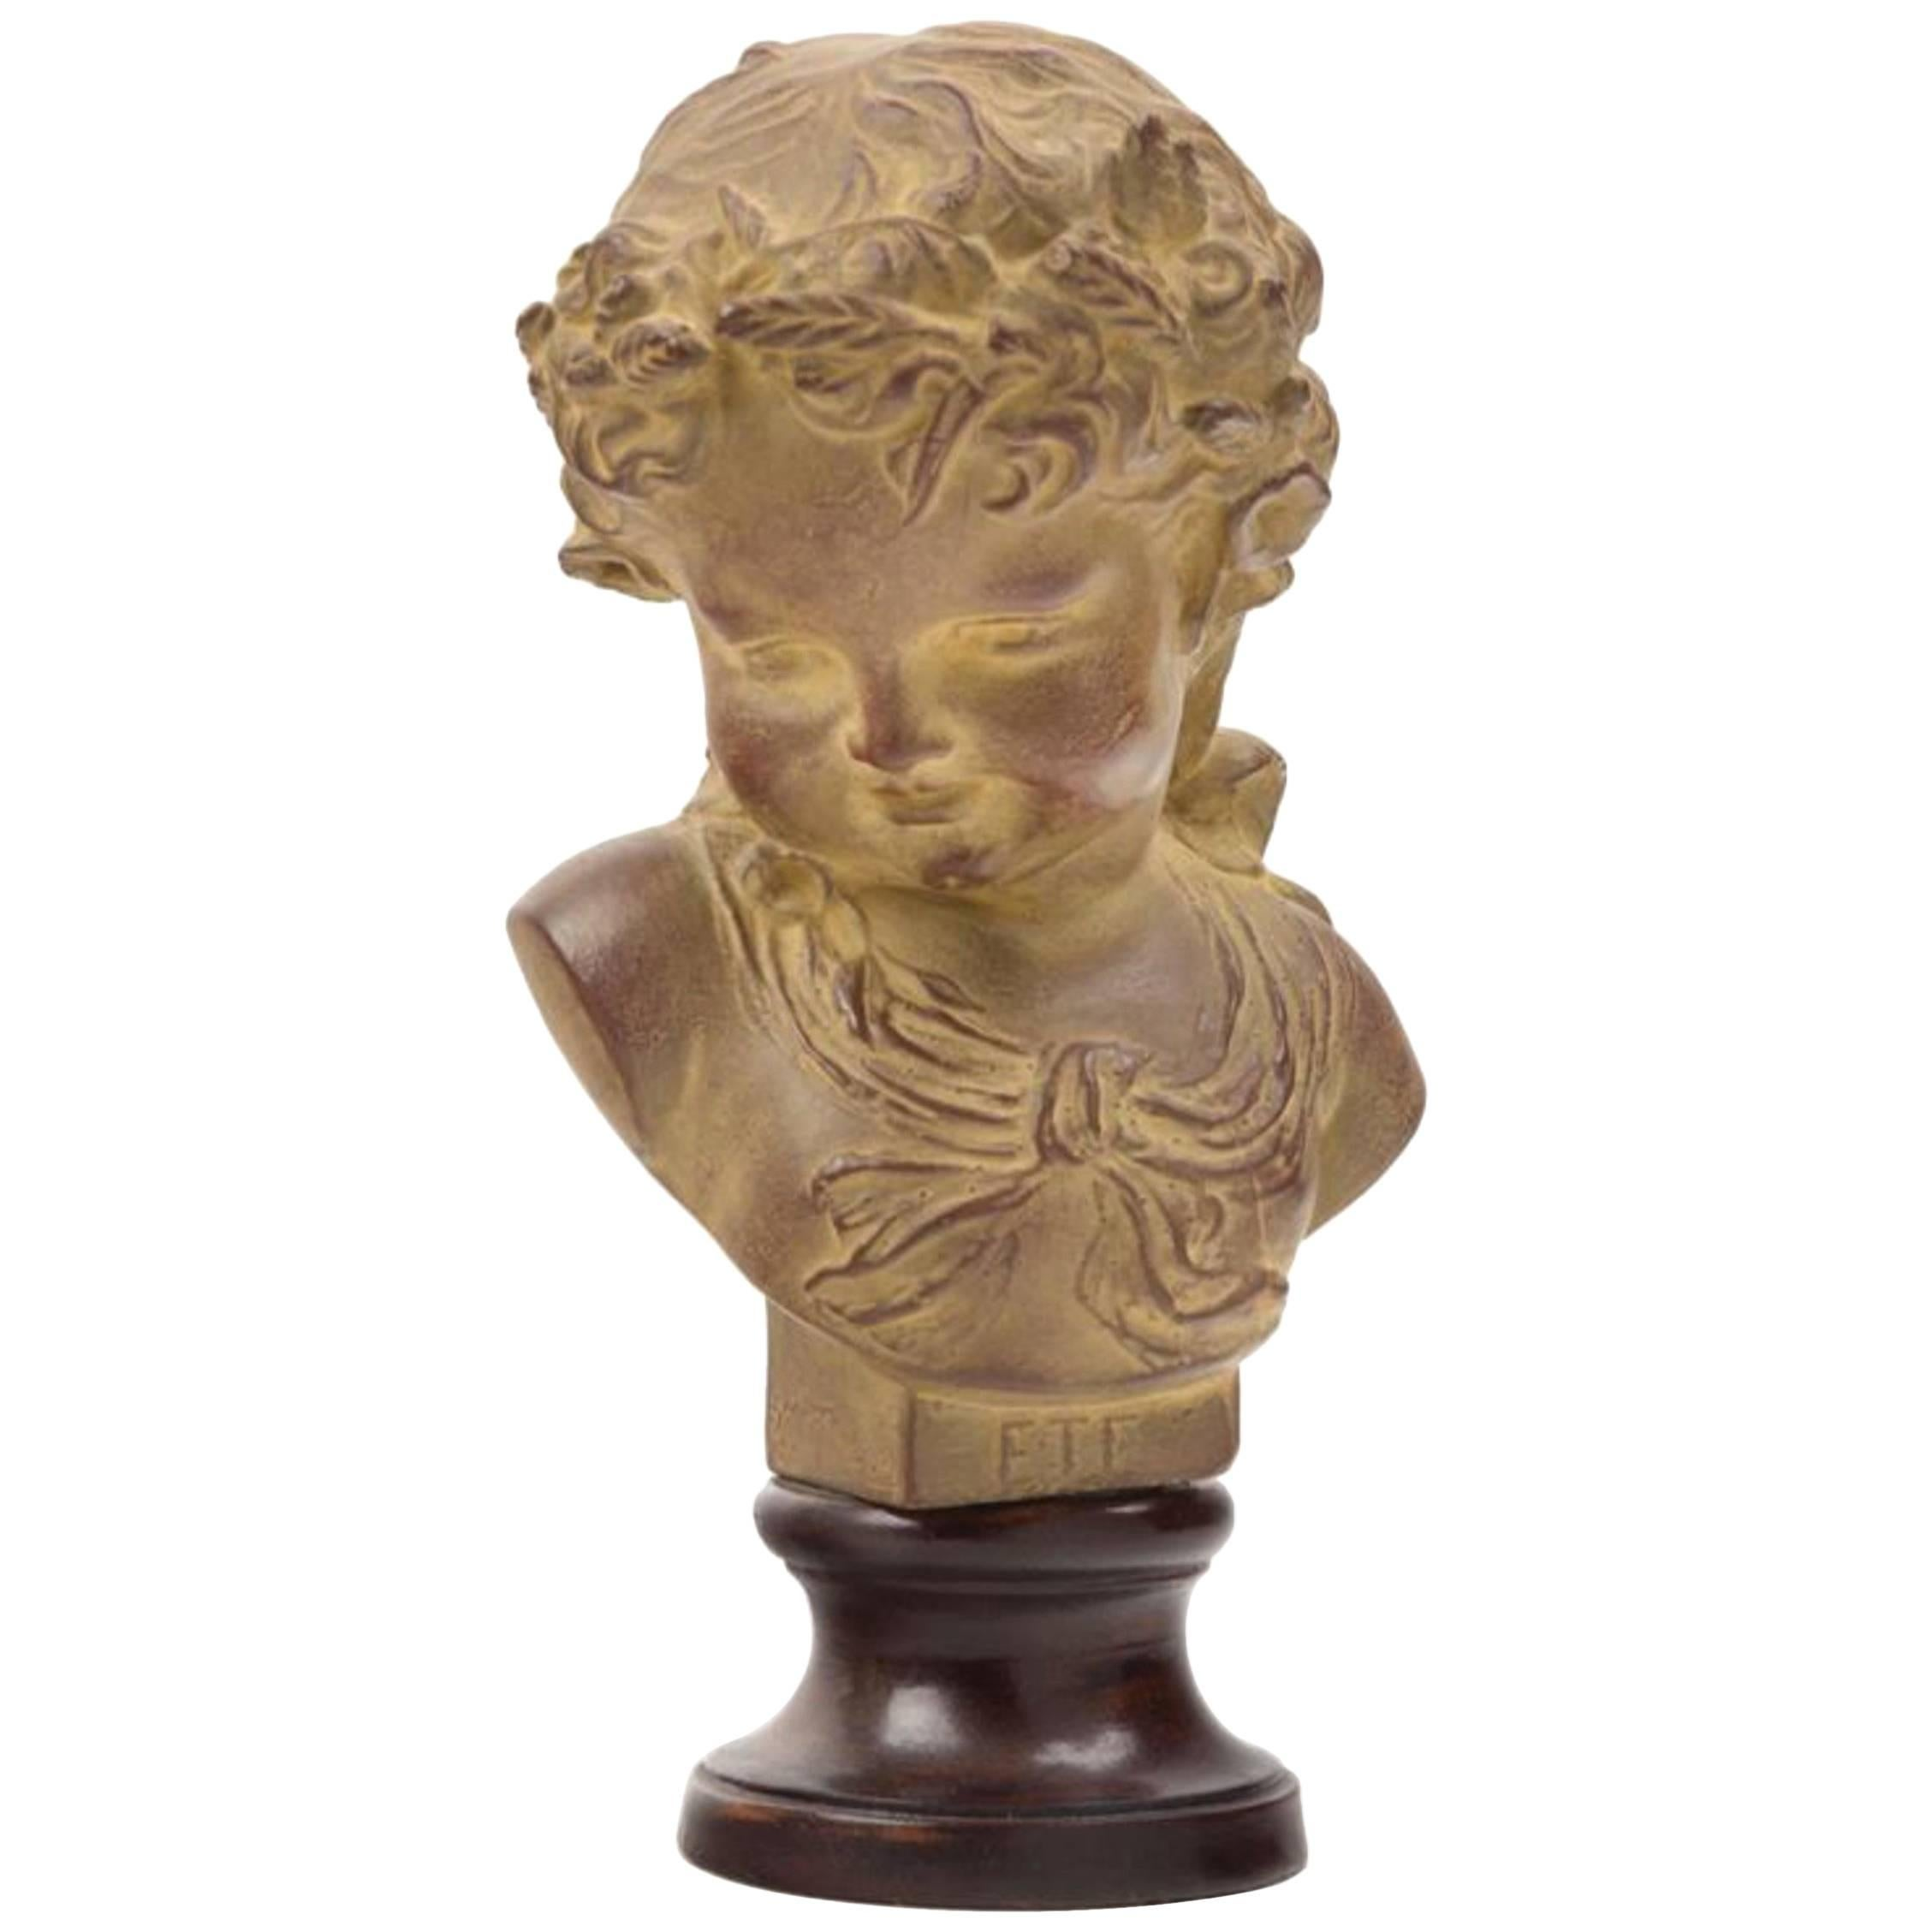 Charming French Terracotta Bust on Ebonized Wood Base Depicting Young Child.